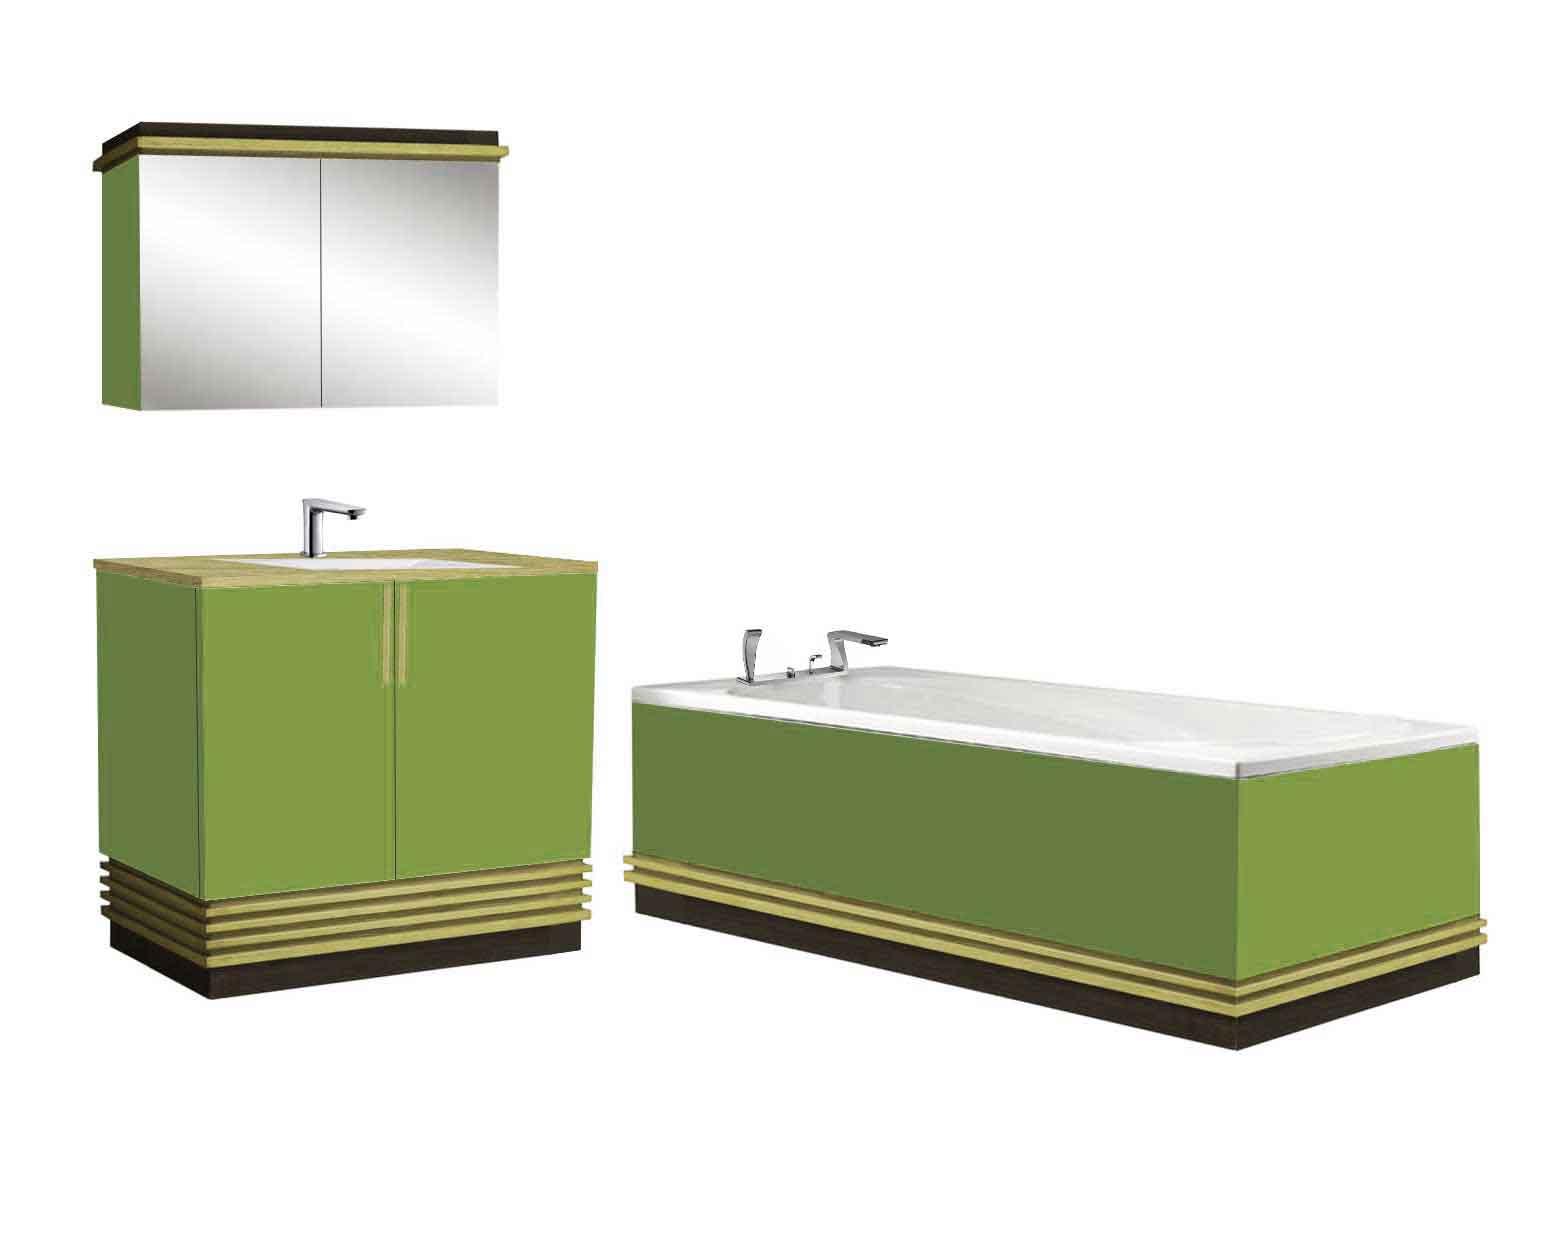 Lastest Bluewater Kitchens Bathrooms Amp Bathrooms